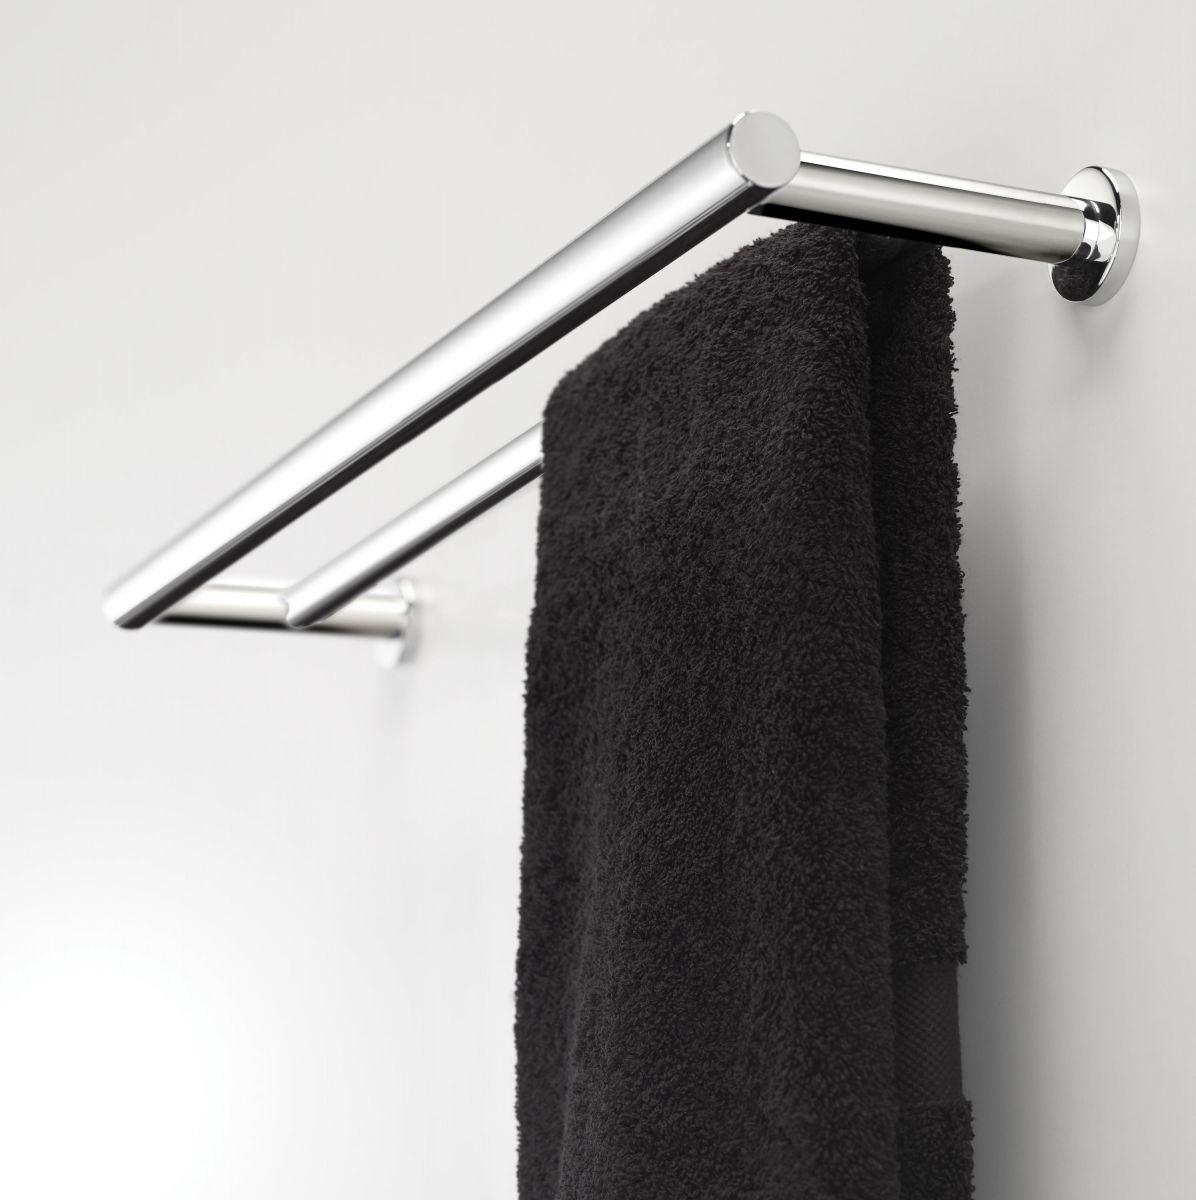 Cosmic Toilet Brush Set